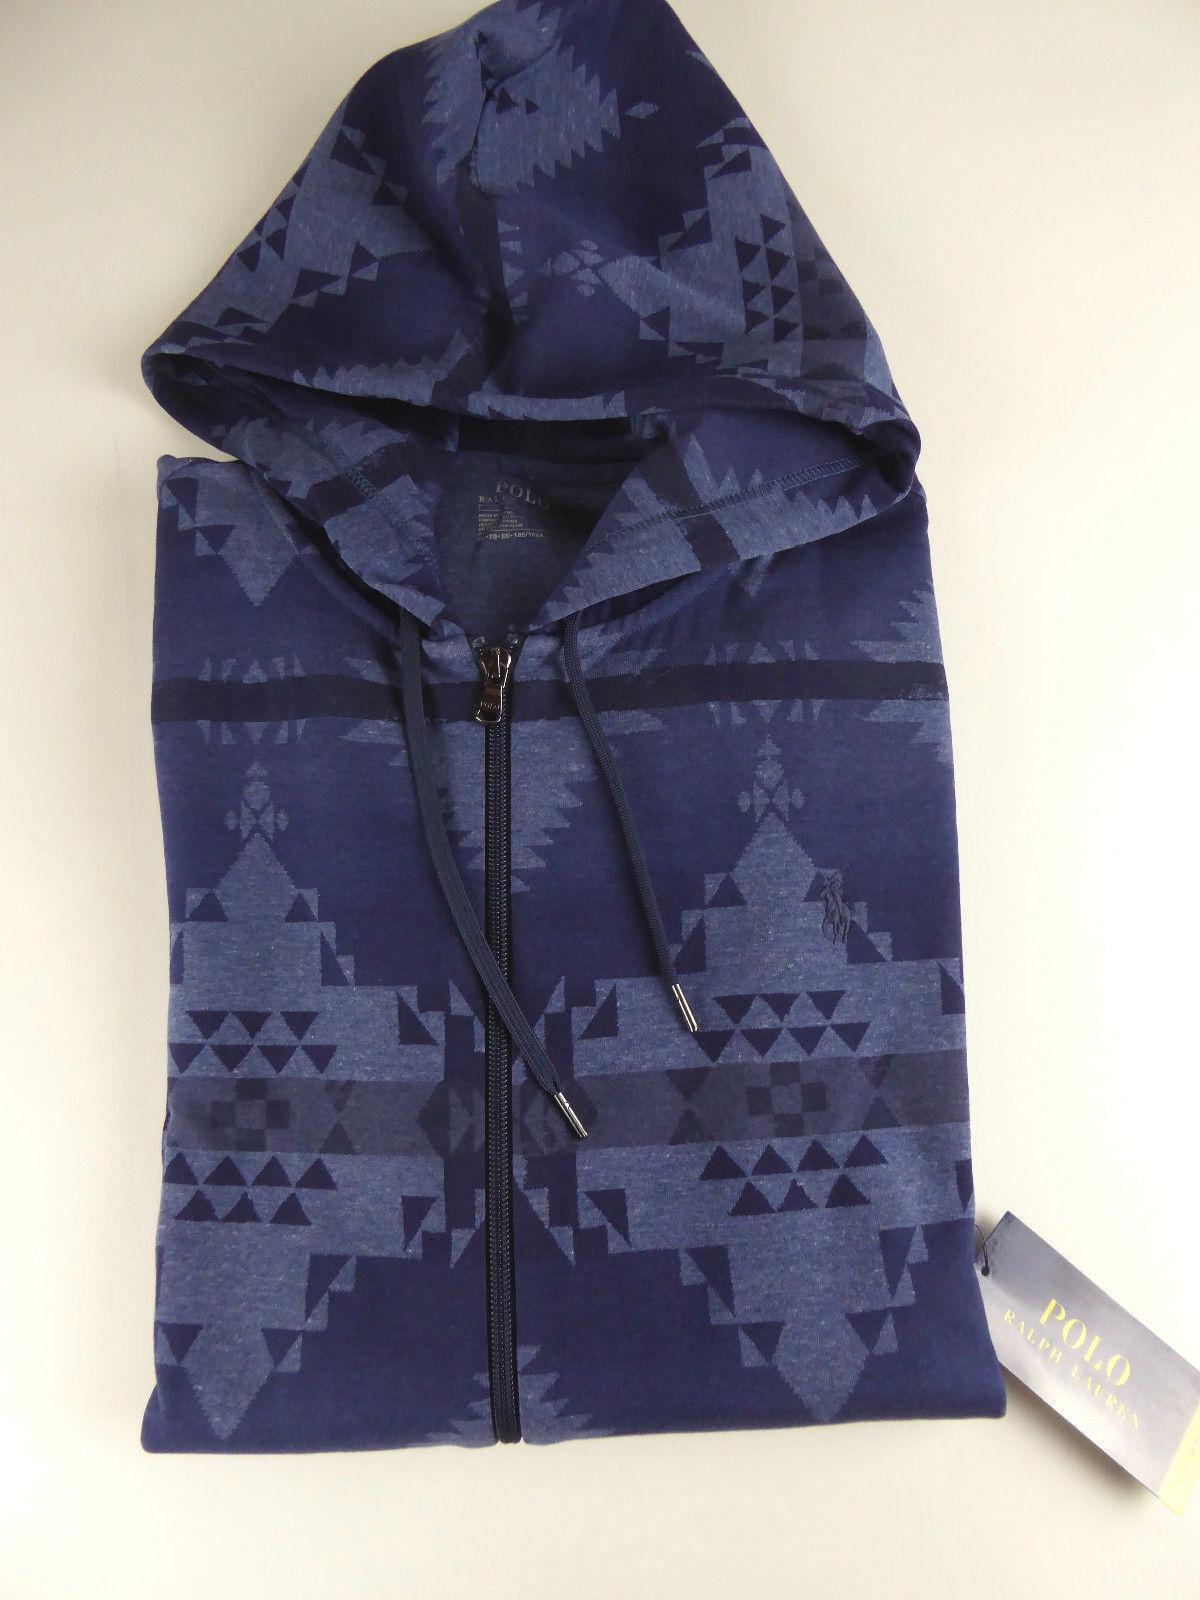 Polo Ralph Lauren Performance Double Knit Southwest Indigo Trail Hoodie NWT 125